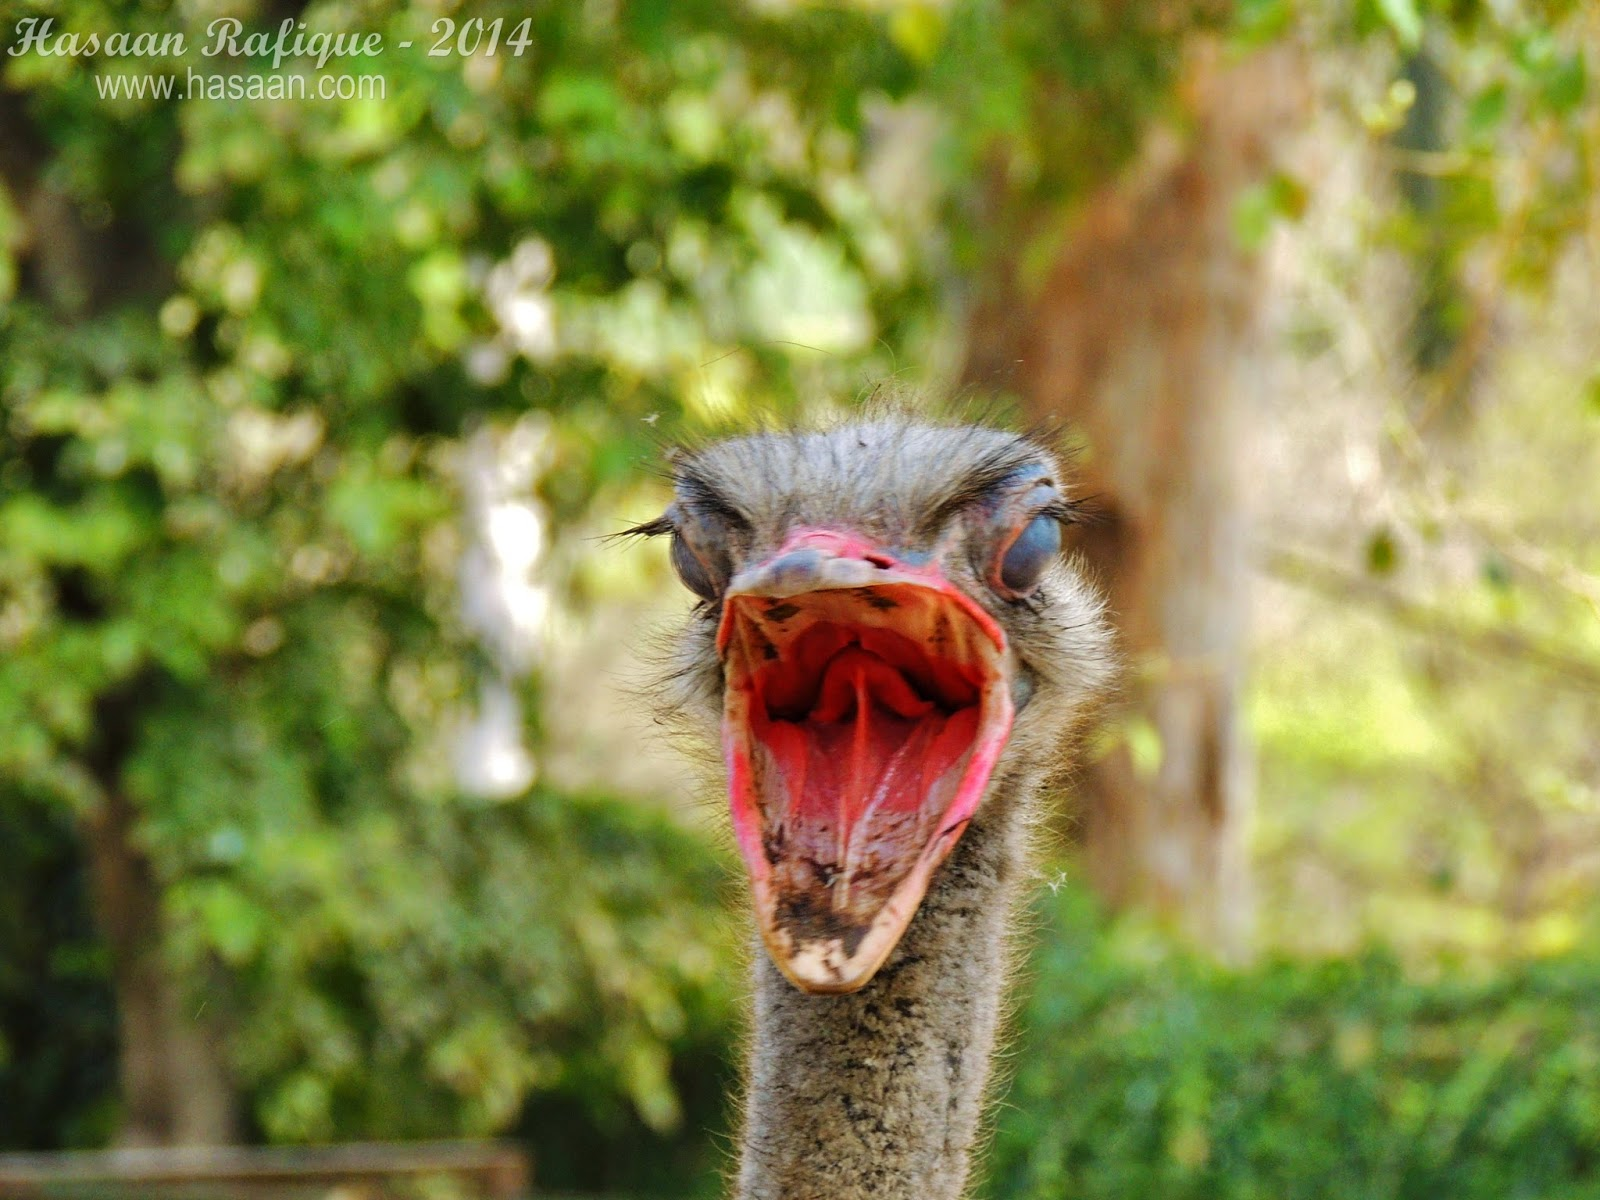 An ostrich captured in a quick fleeting moment.